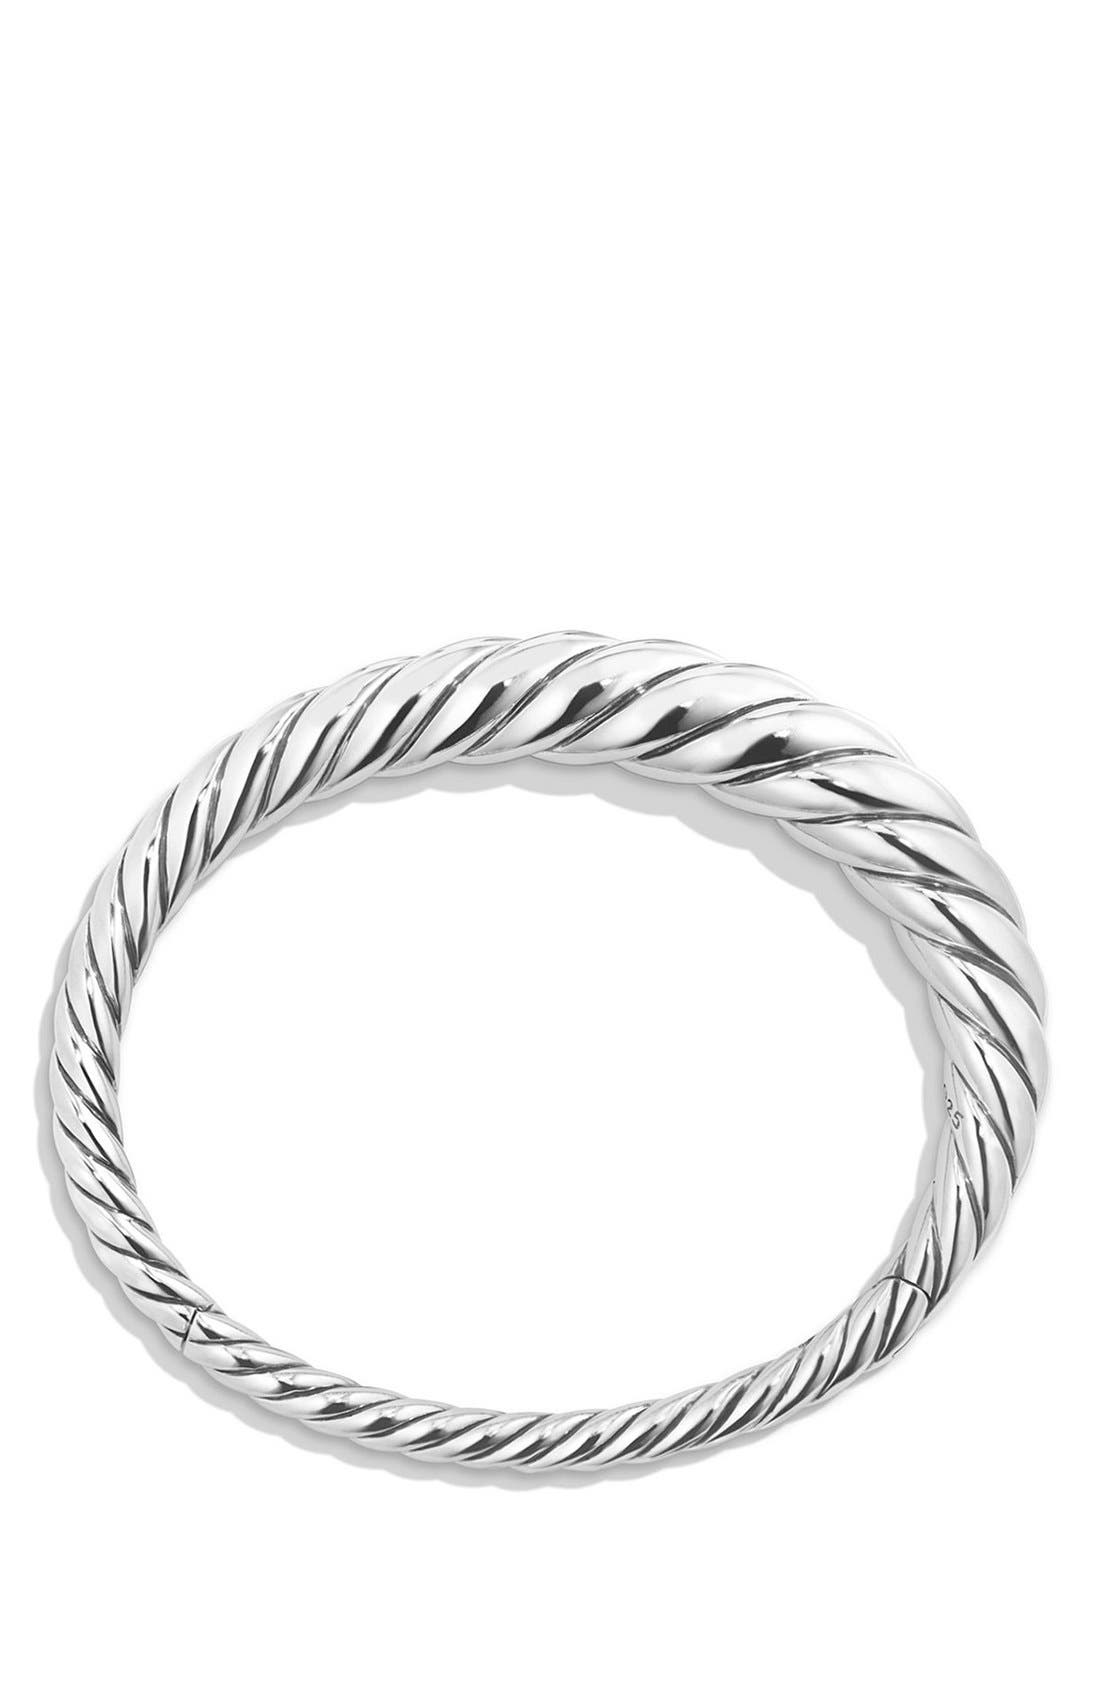 'Pure Form' Small Cable Bracelet,                             Alternate thumbnail 2, color,                             SILVER